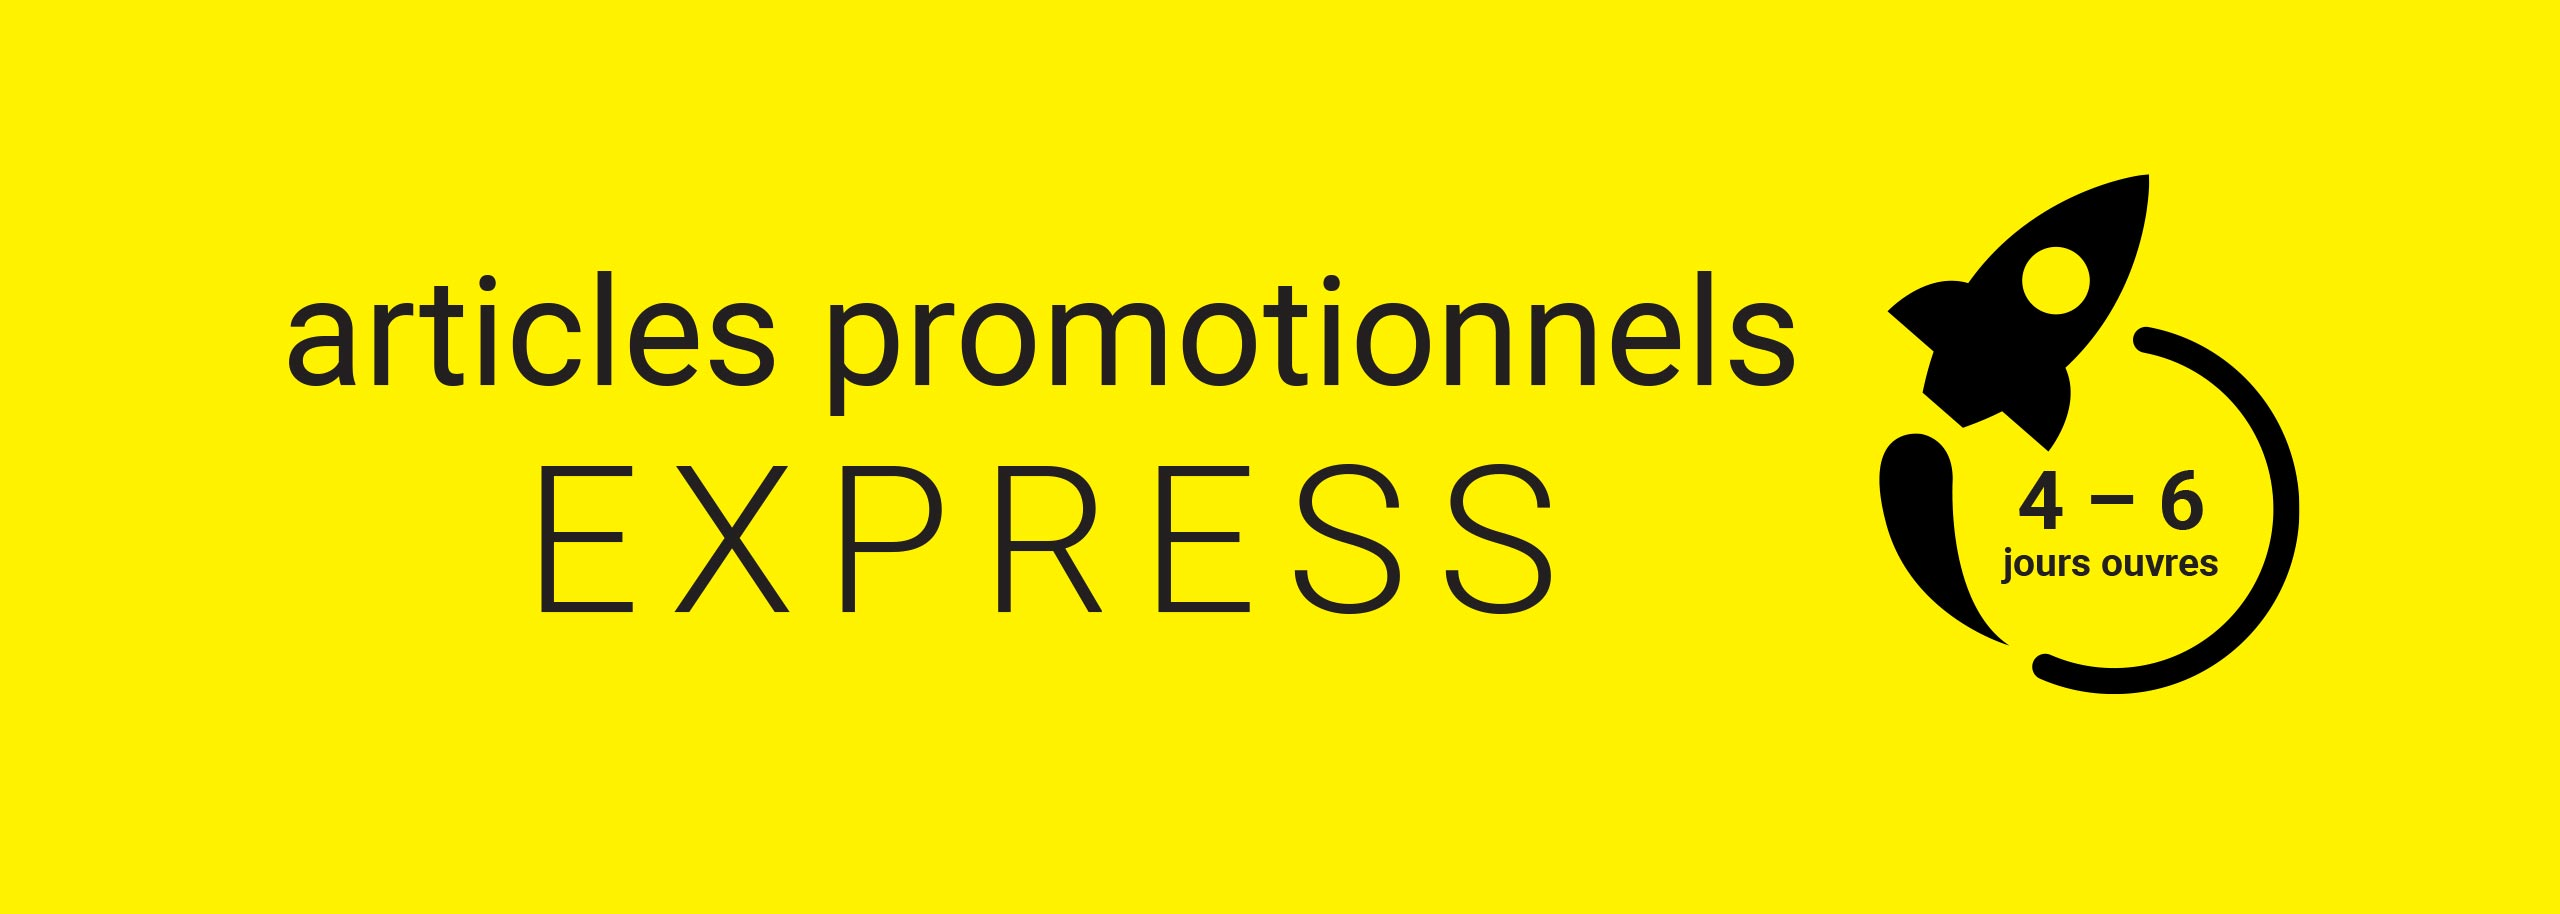 Articles promotionnels express